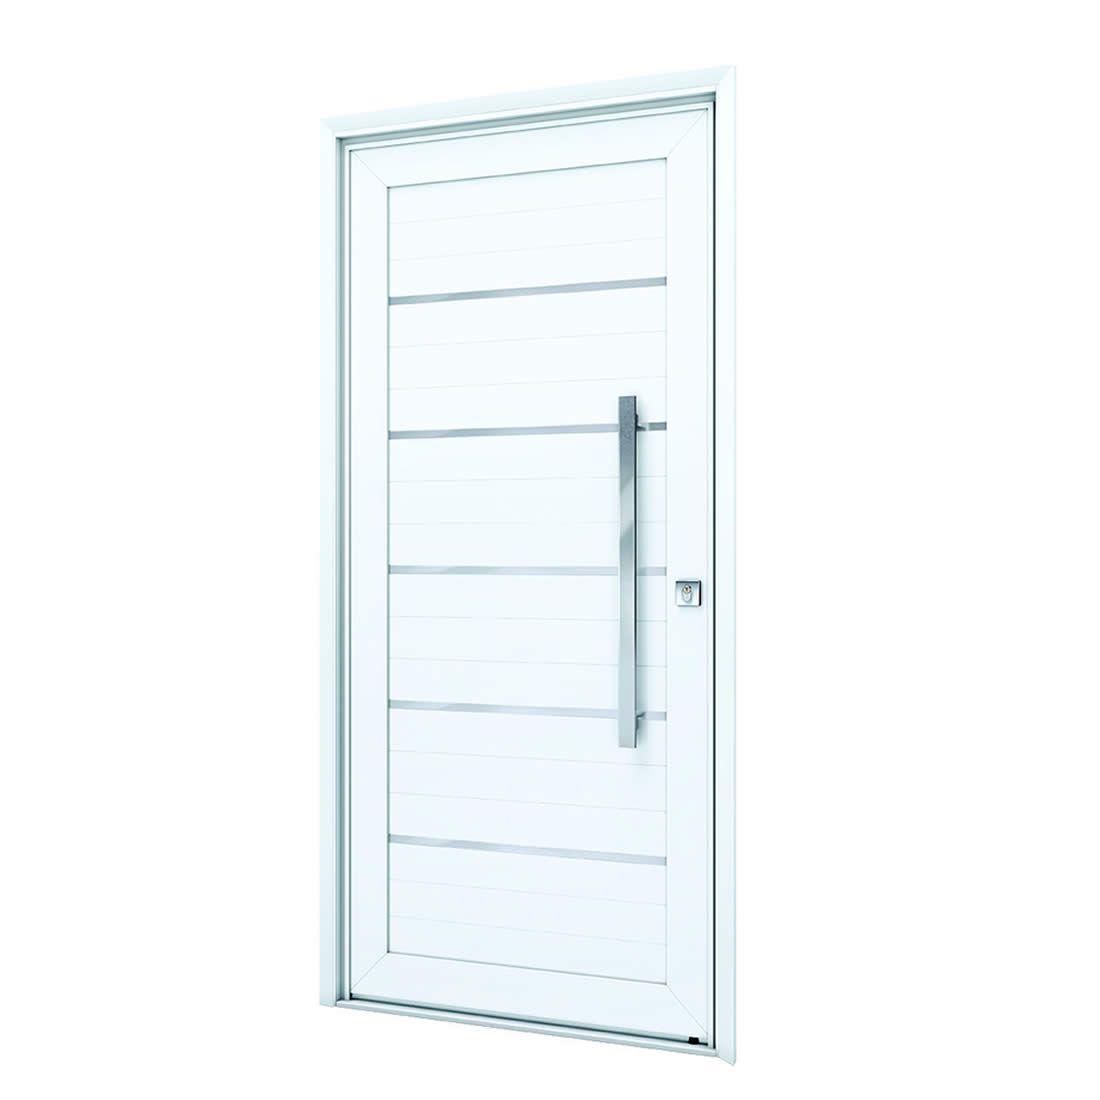 Porta Pivotante de Aluminio Branca C/Friso Abertura Esquerda Ref: 9195.1